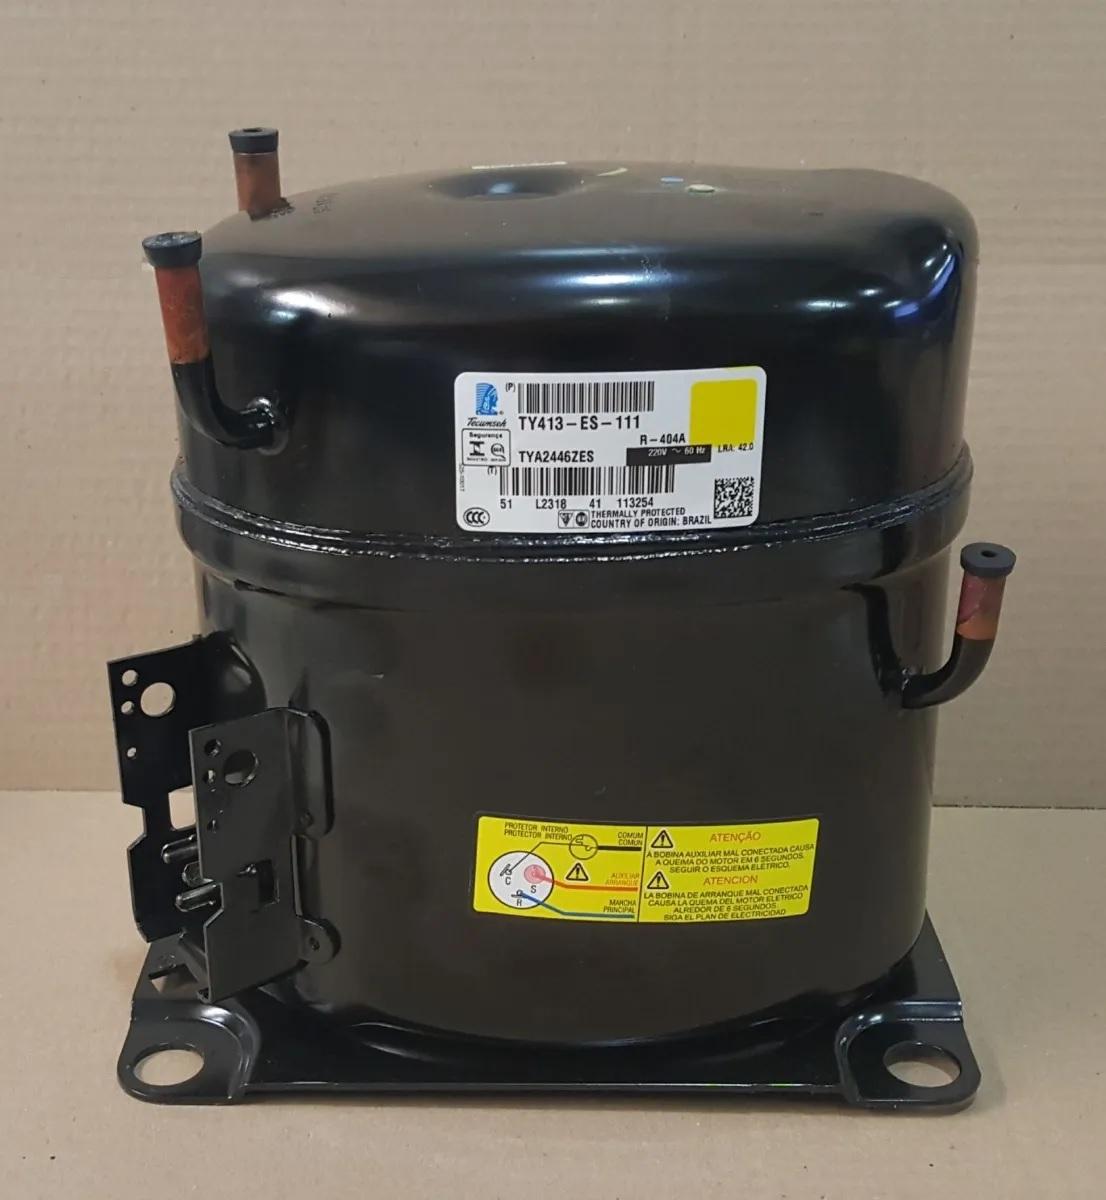 Motor Compressor 1 1/2 Hp Tya2446zes 220v R404 Italianinha